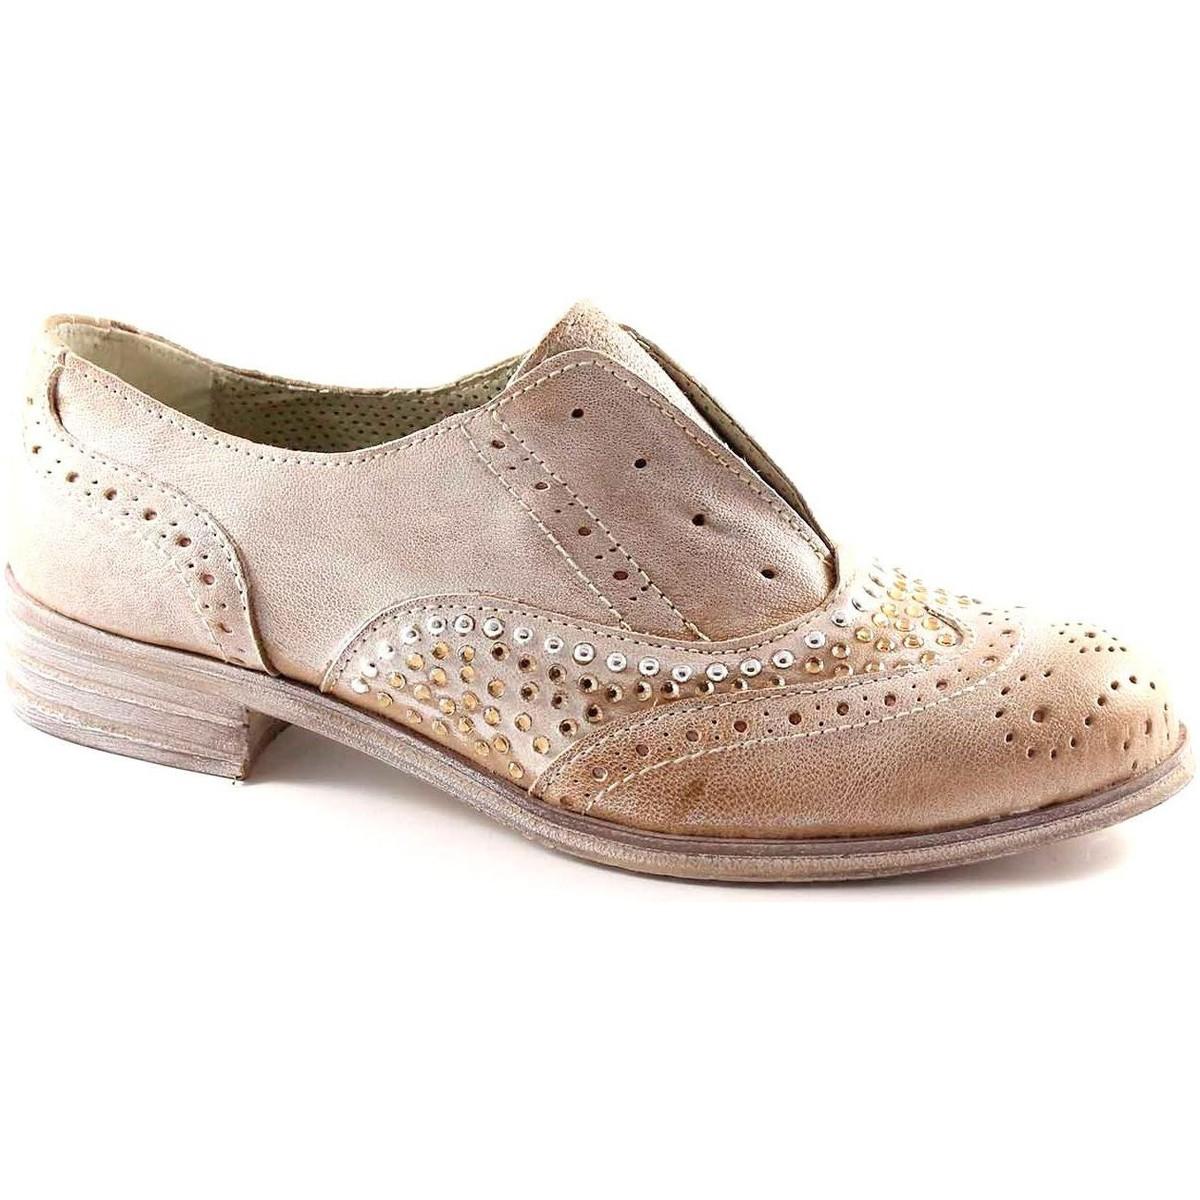 Divine Follie 829B taupe scarpa donna inglesina elastico strass Beige -  Consegna gratuita con Spartoo.it ! - Scarpe Richelieu Donna 92,00 €